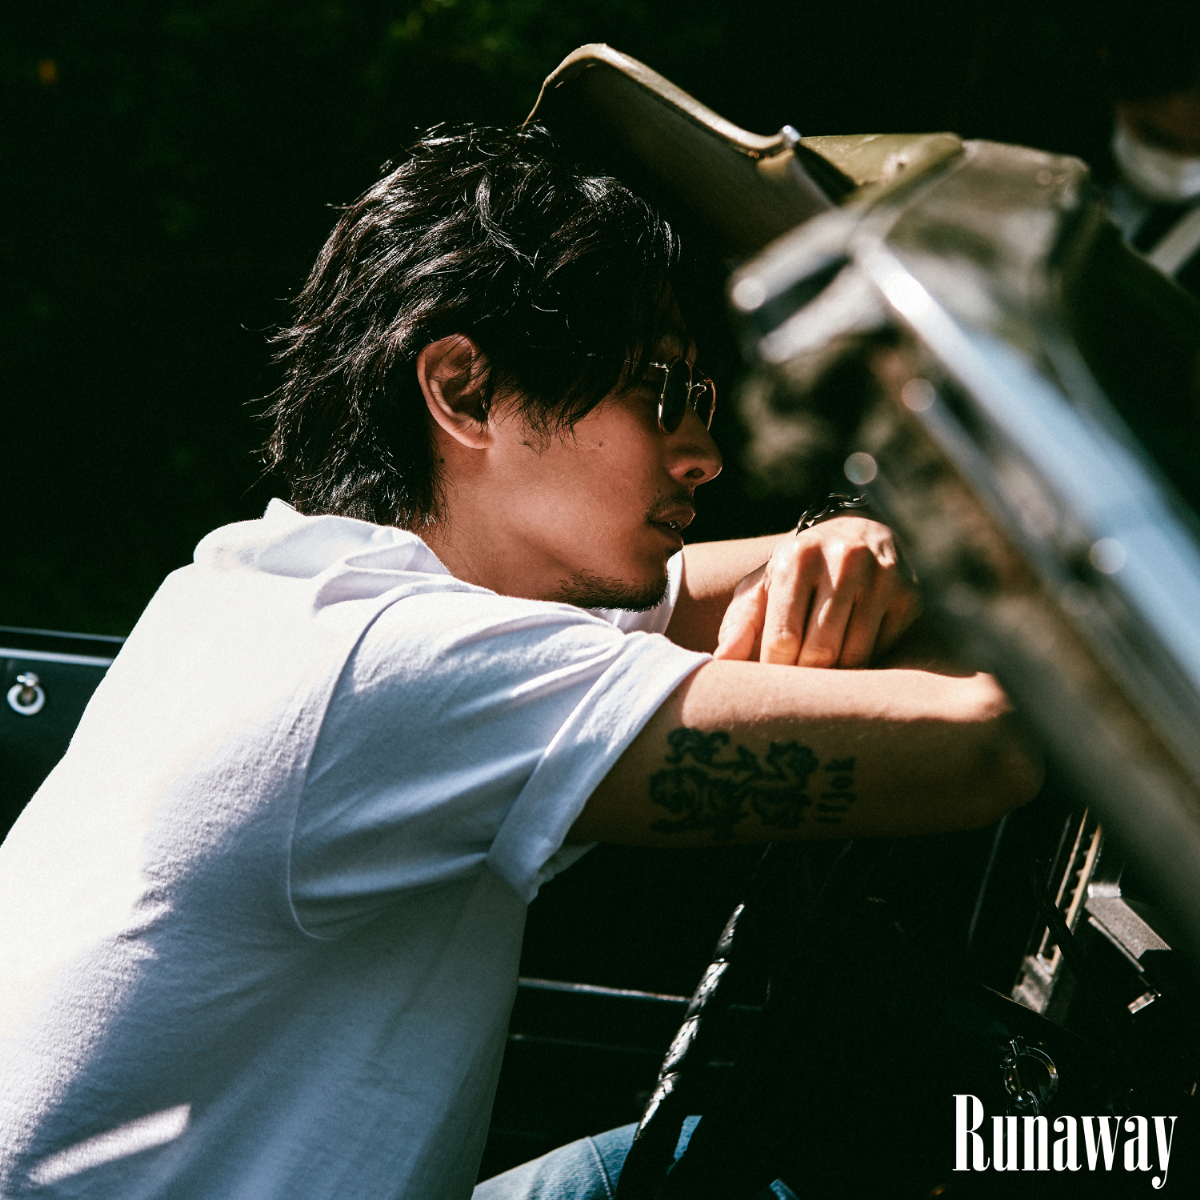 「Runaway」ジャケット